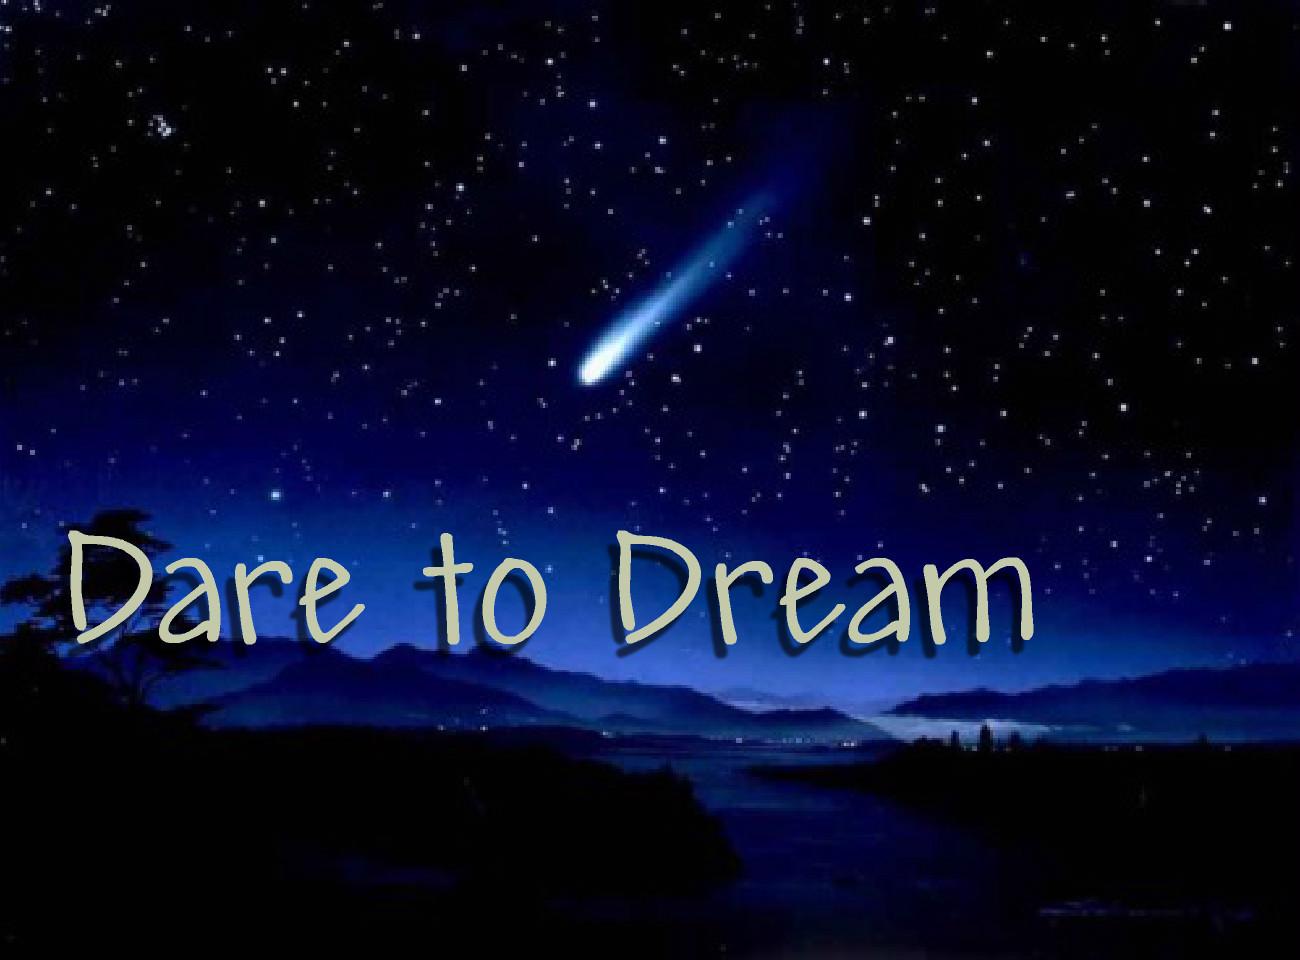 spiritual life coaching – dare to dream | finish strong journal